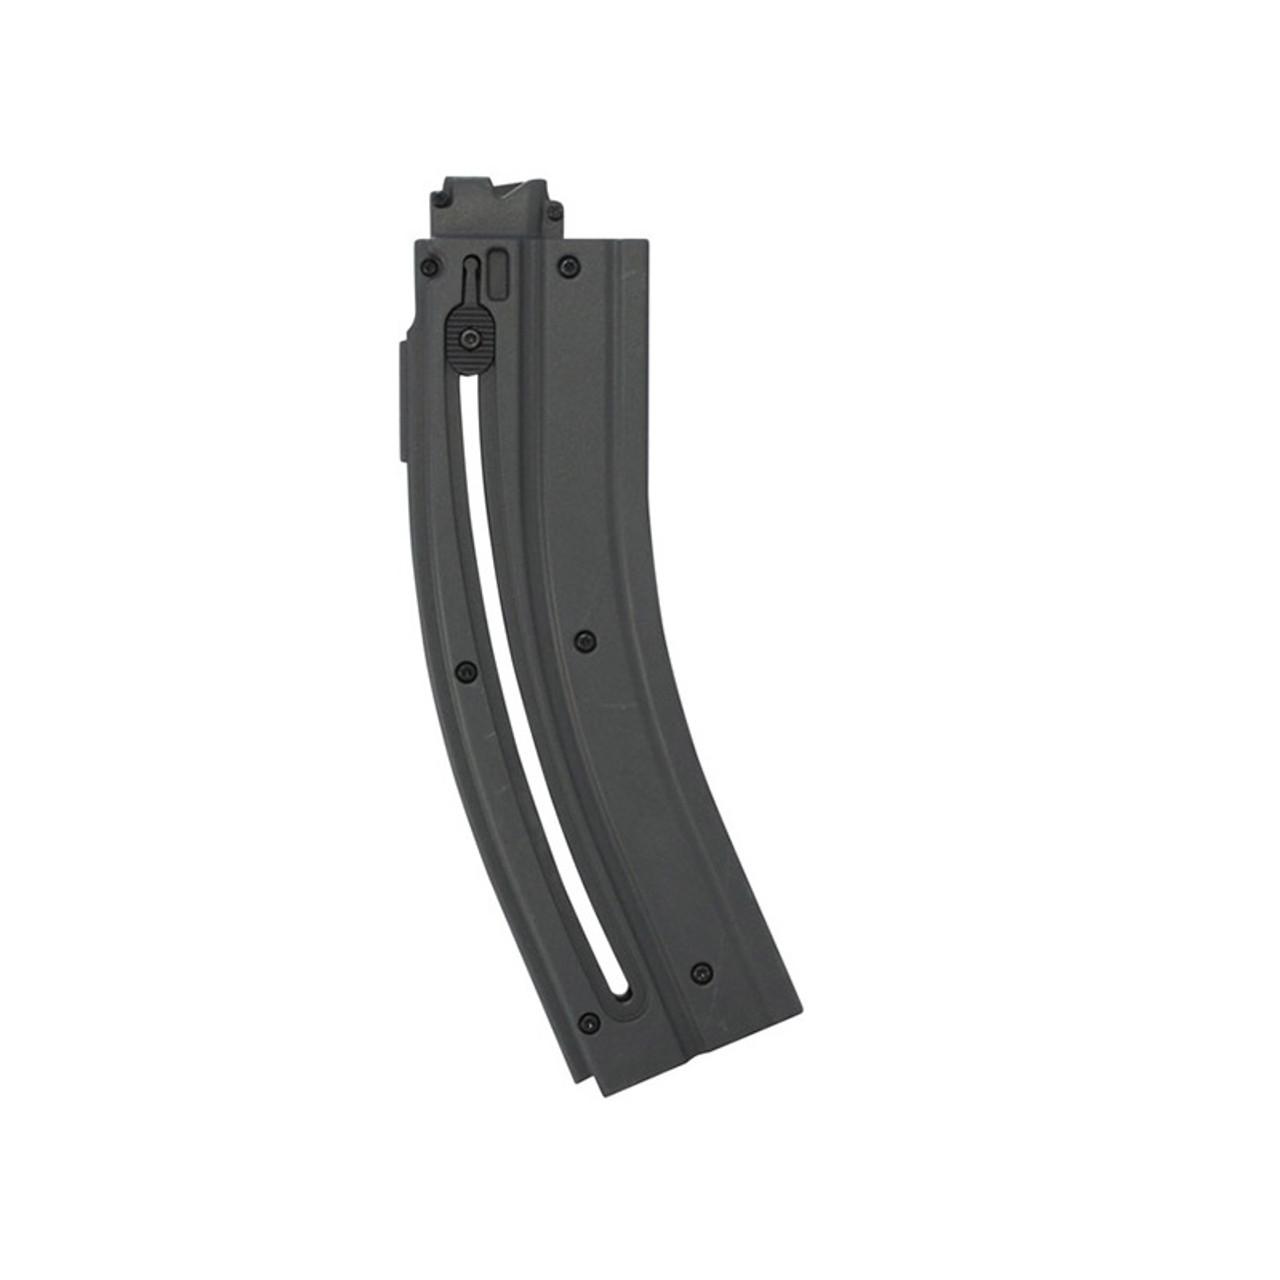 Walther  22LR 30 round magazine for Colt M4 M16 HK416 G36 Beretta ARX160  Hammerli Tac R1